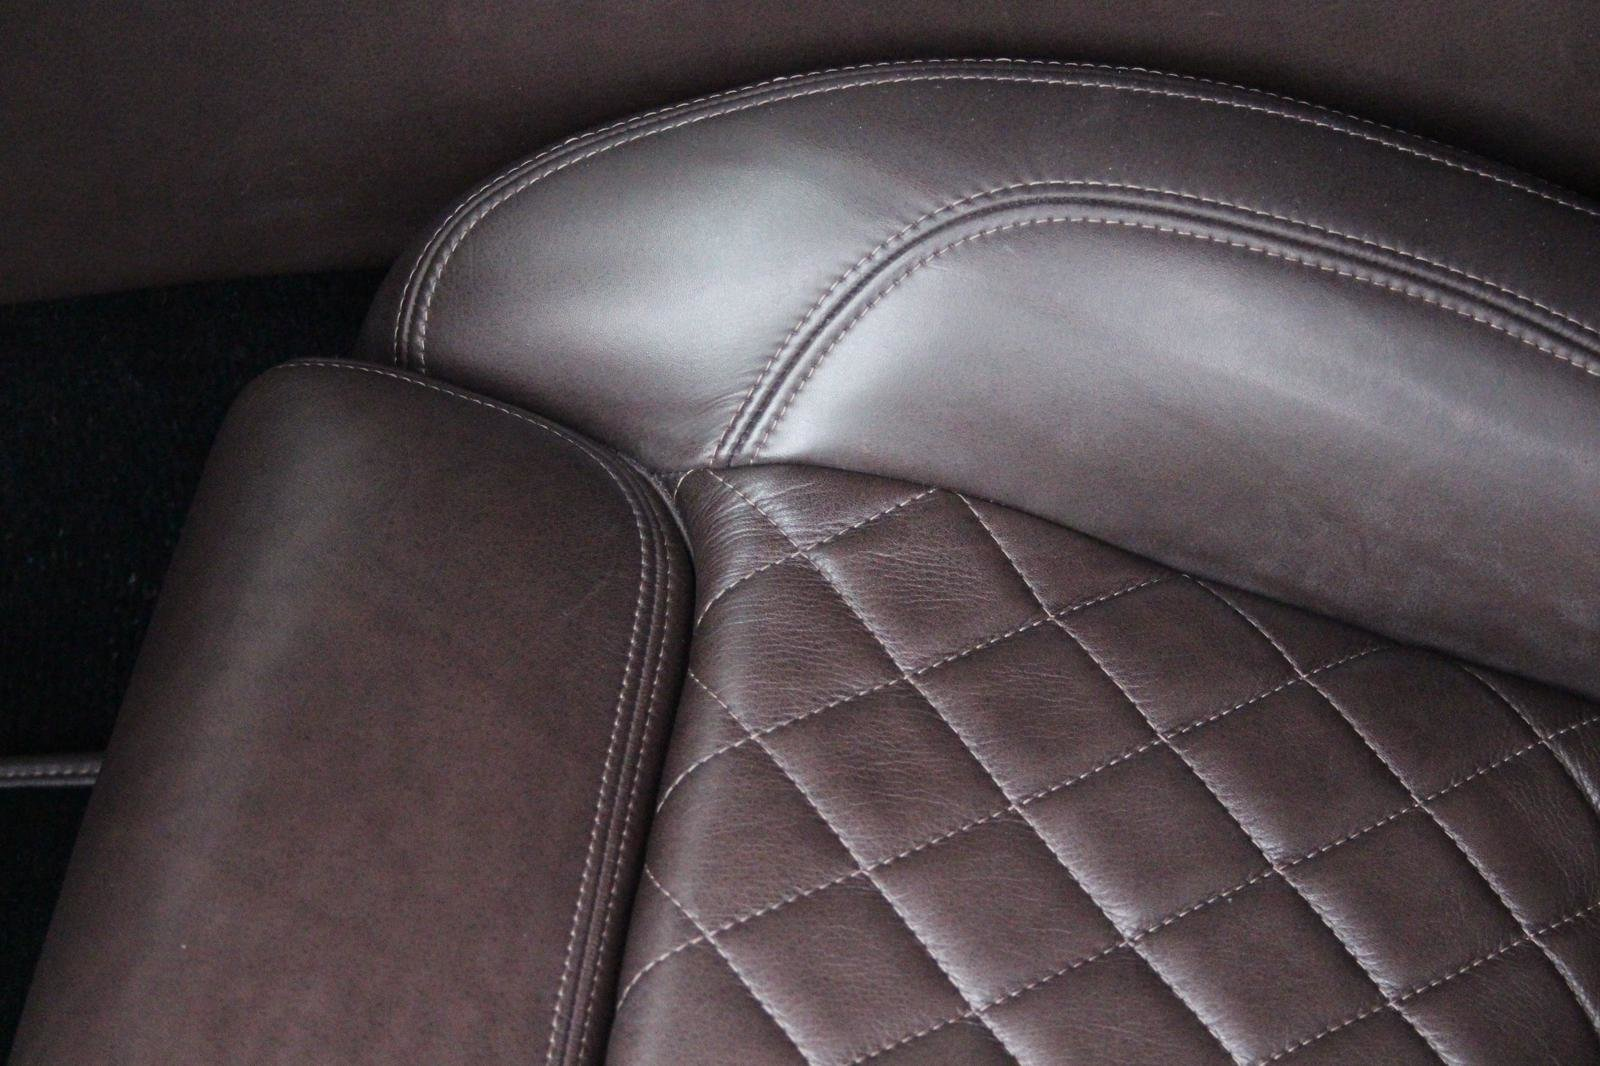 2004 Aston Martin DB 7 GT Zagato LHD  For Sale (picture 6 of 6)